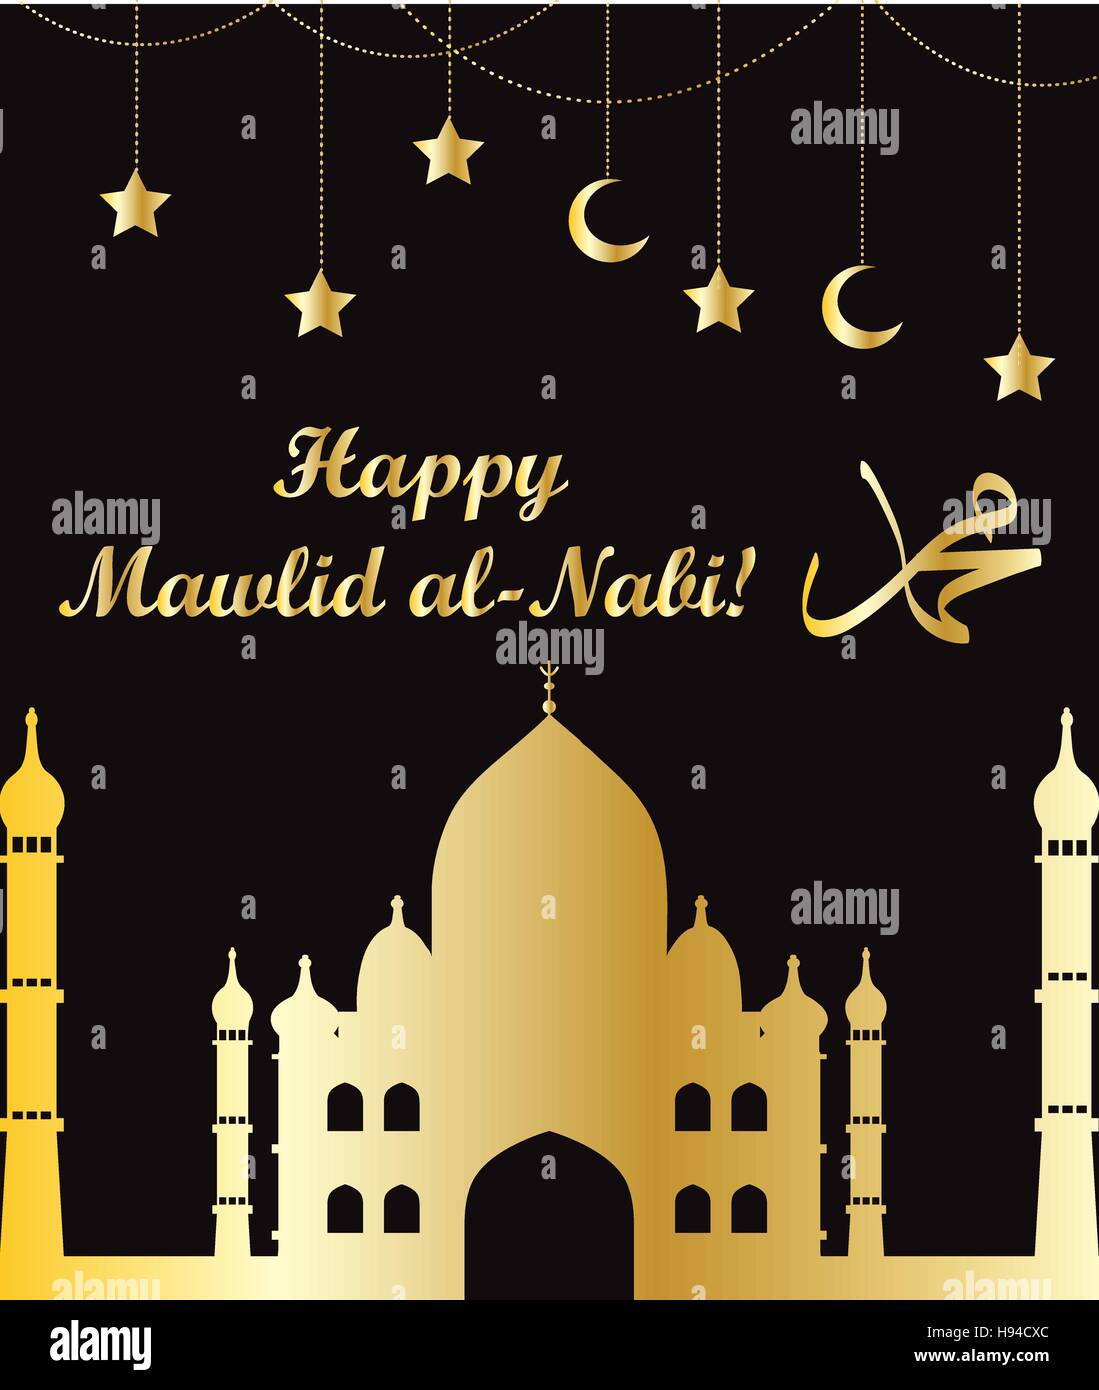 Mawlid al nabi the birthday of the prophet muhammad greeting card mawlid al nabi the birthday of the prophet muhammad greeting card muslim celebration poster flyer vector illustration m4hsunfo